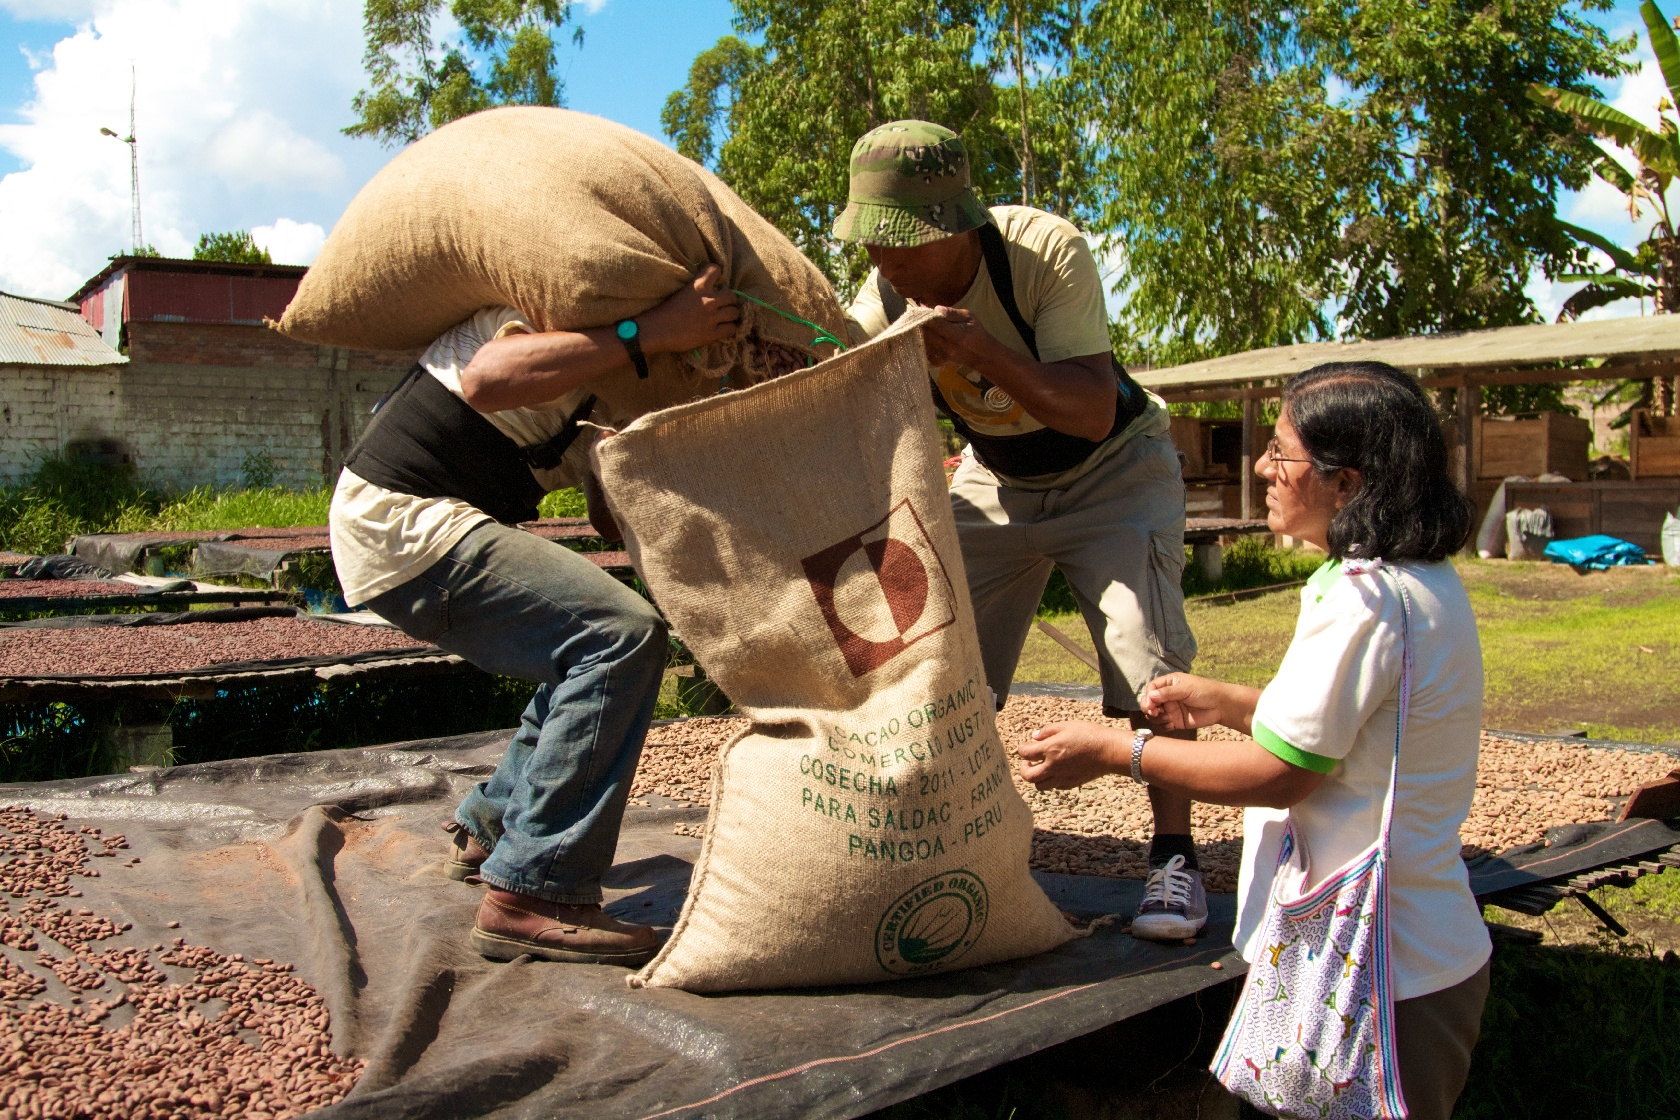 Esperanza supervises Pangoa employees preparing sacks of dried cacao. (Photo: Root Capital)